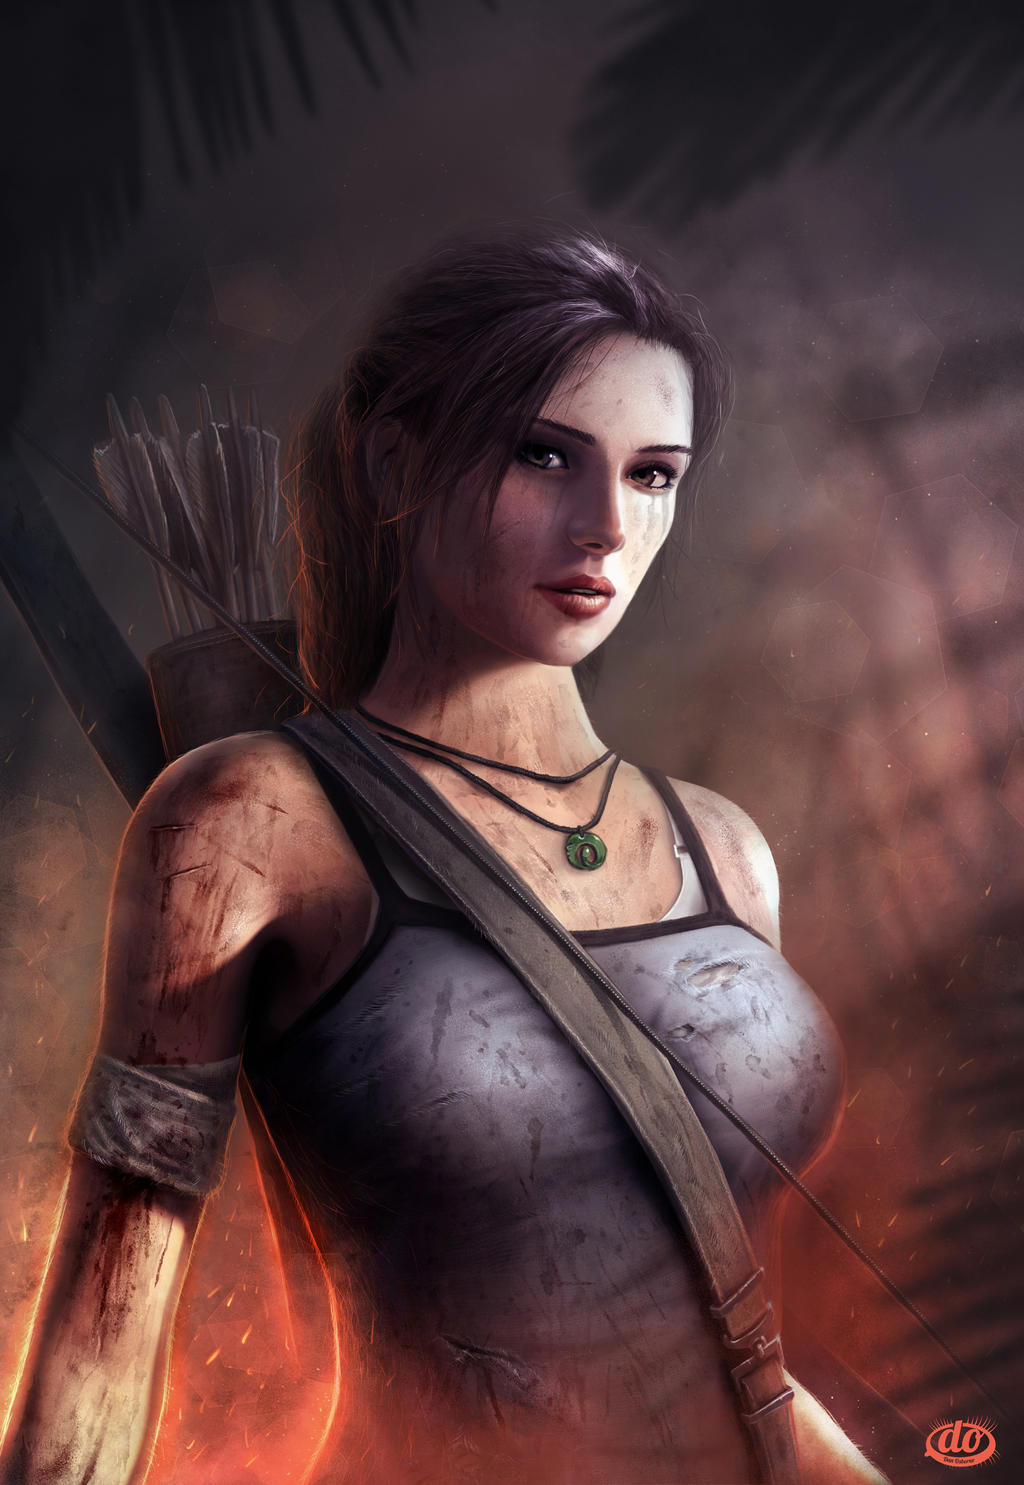 Lara Croft by danosborne